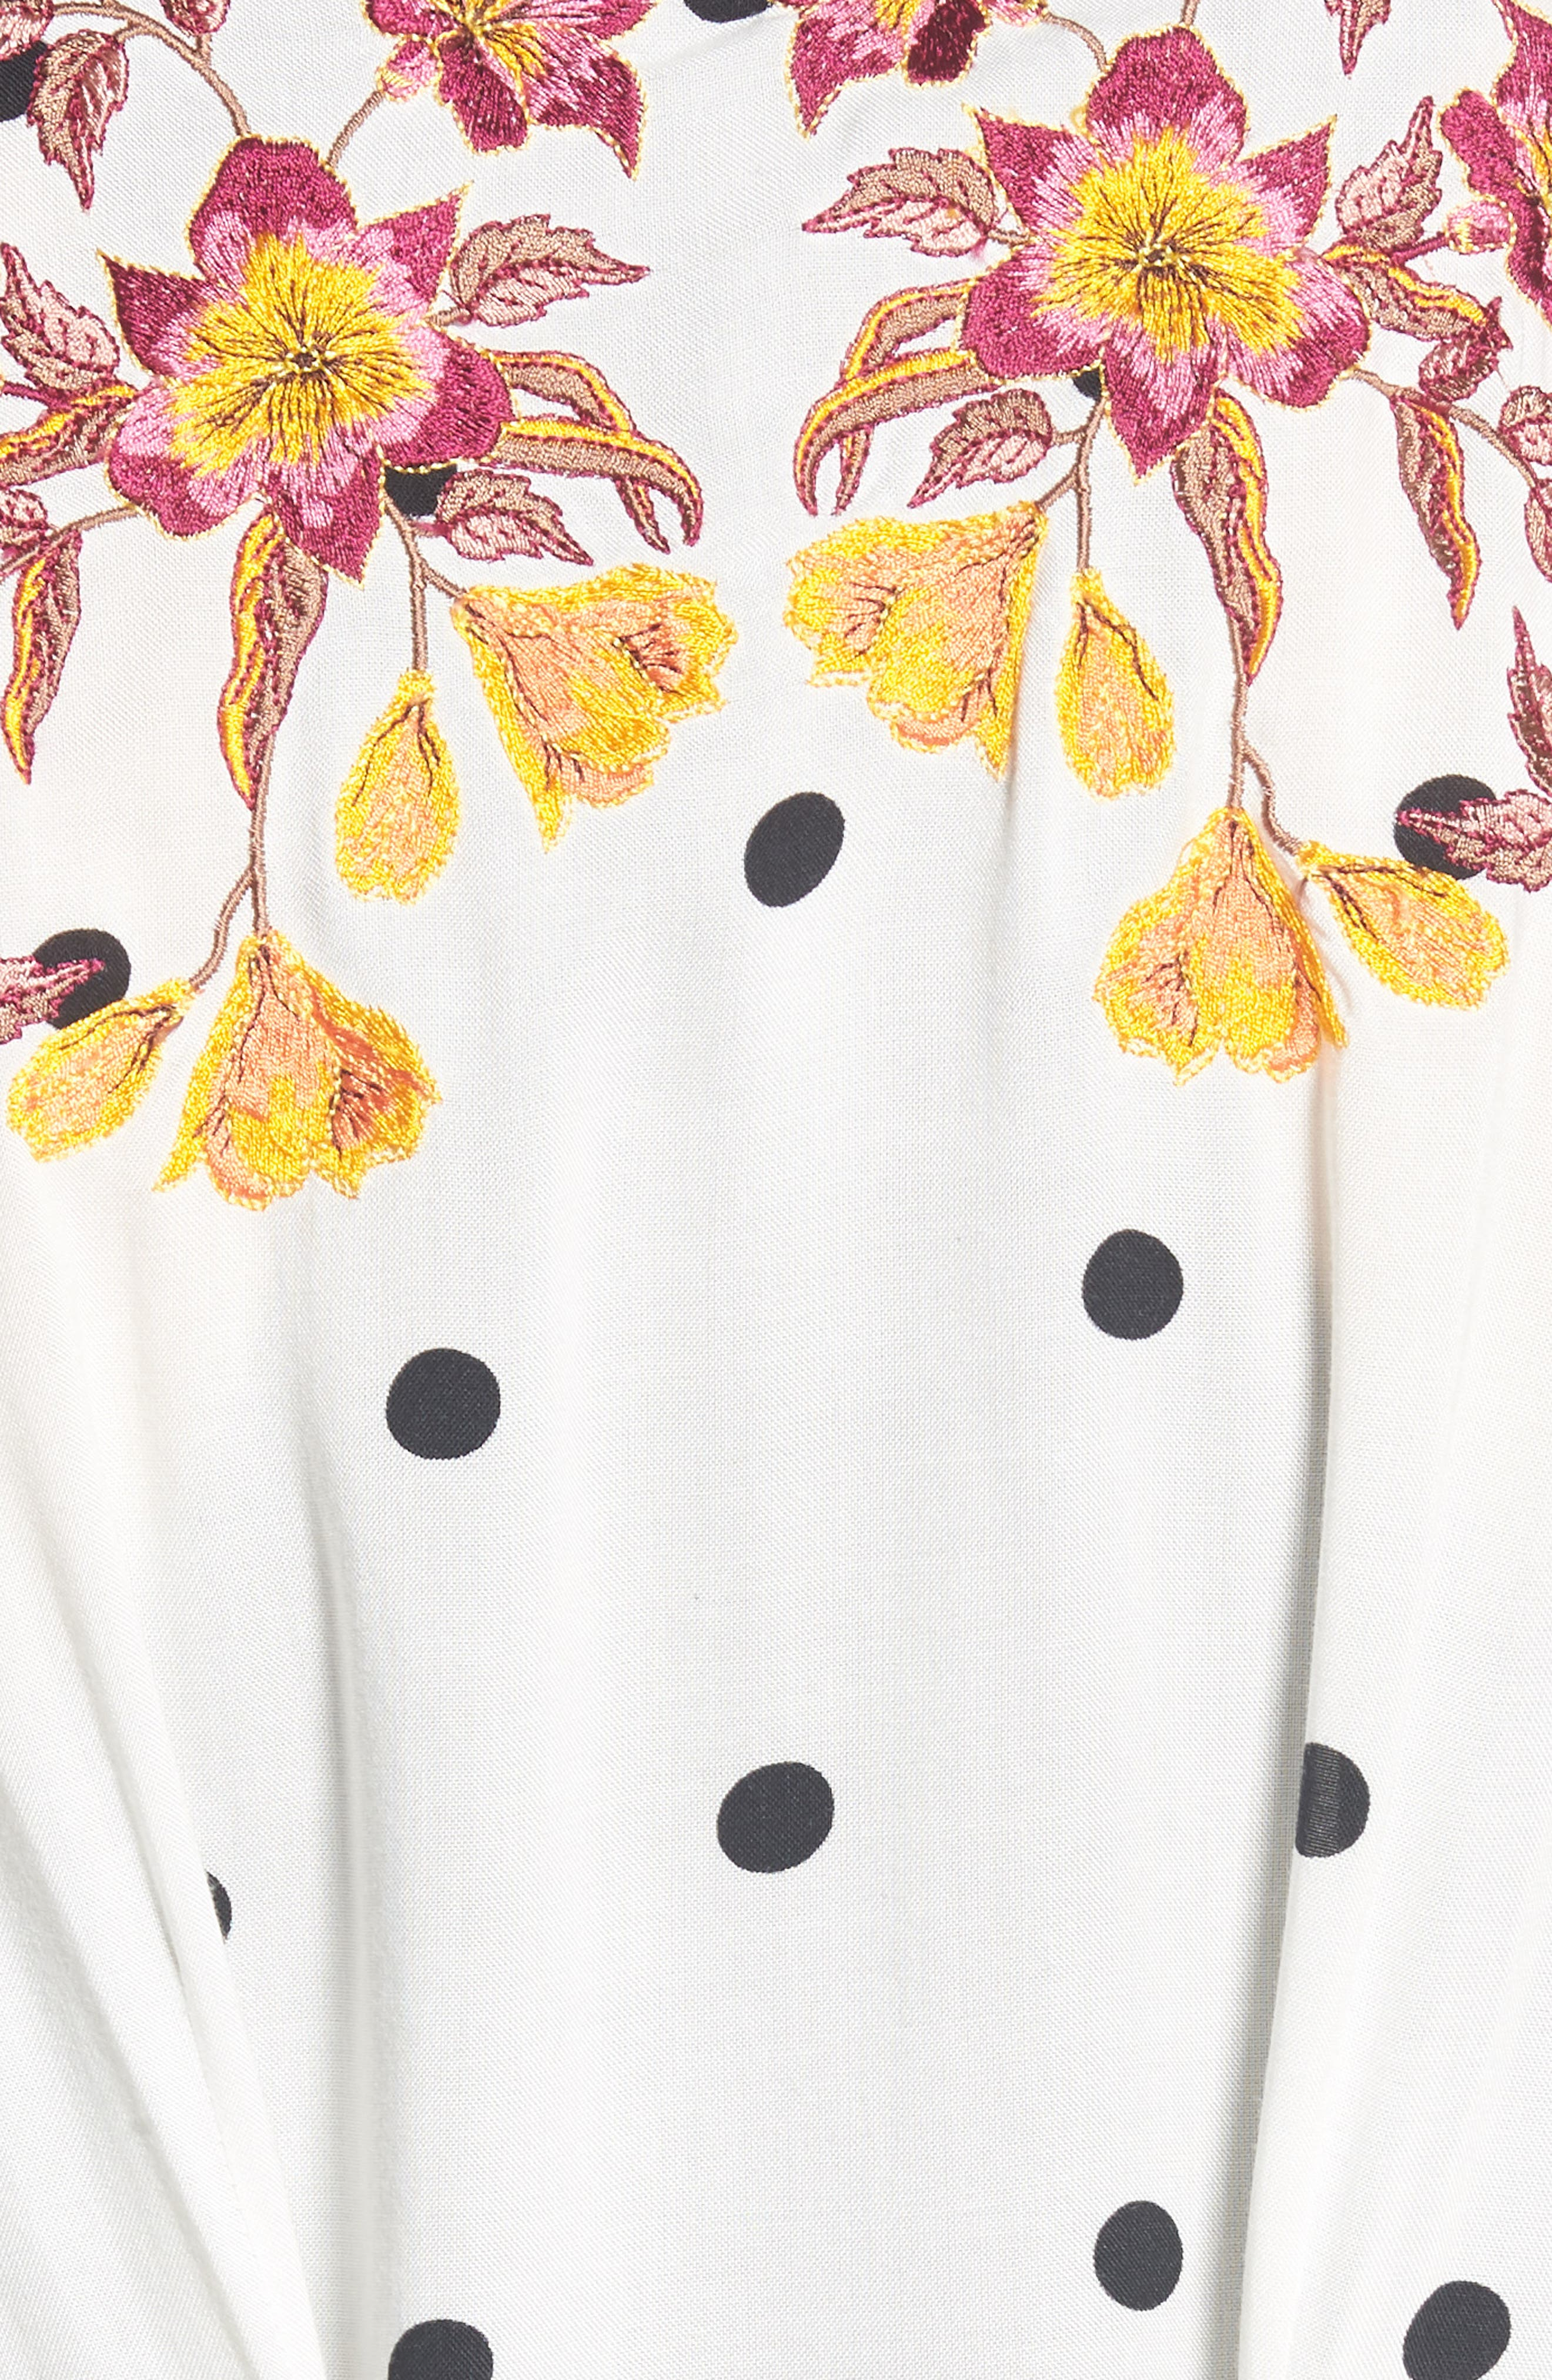 Hot Spot Kimono,                             Alternate thumbnail 5, color,                             Black/ White Polka Dot Print